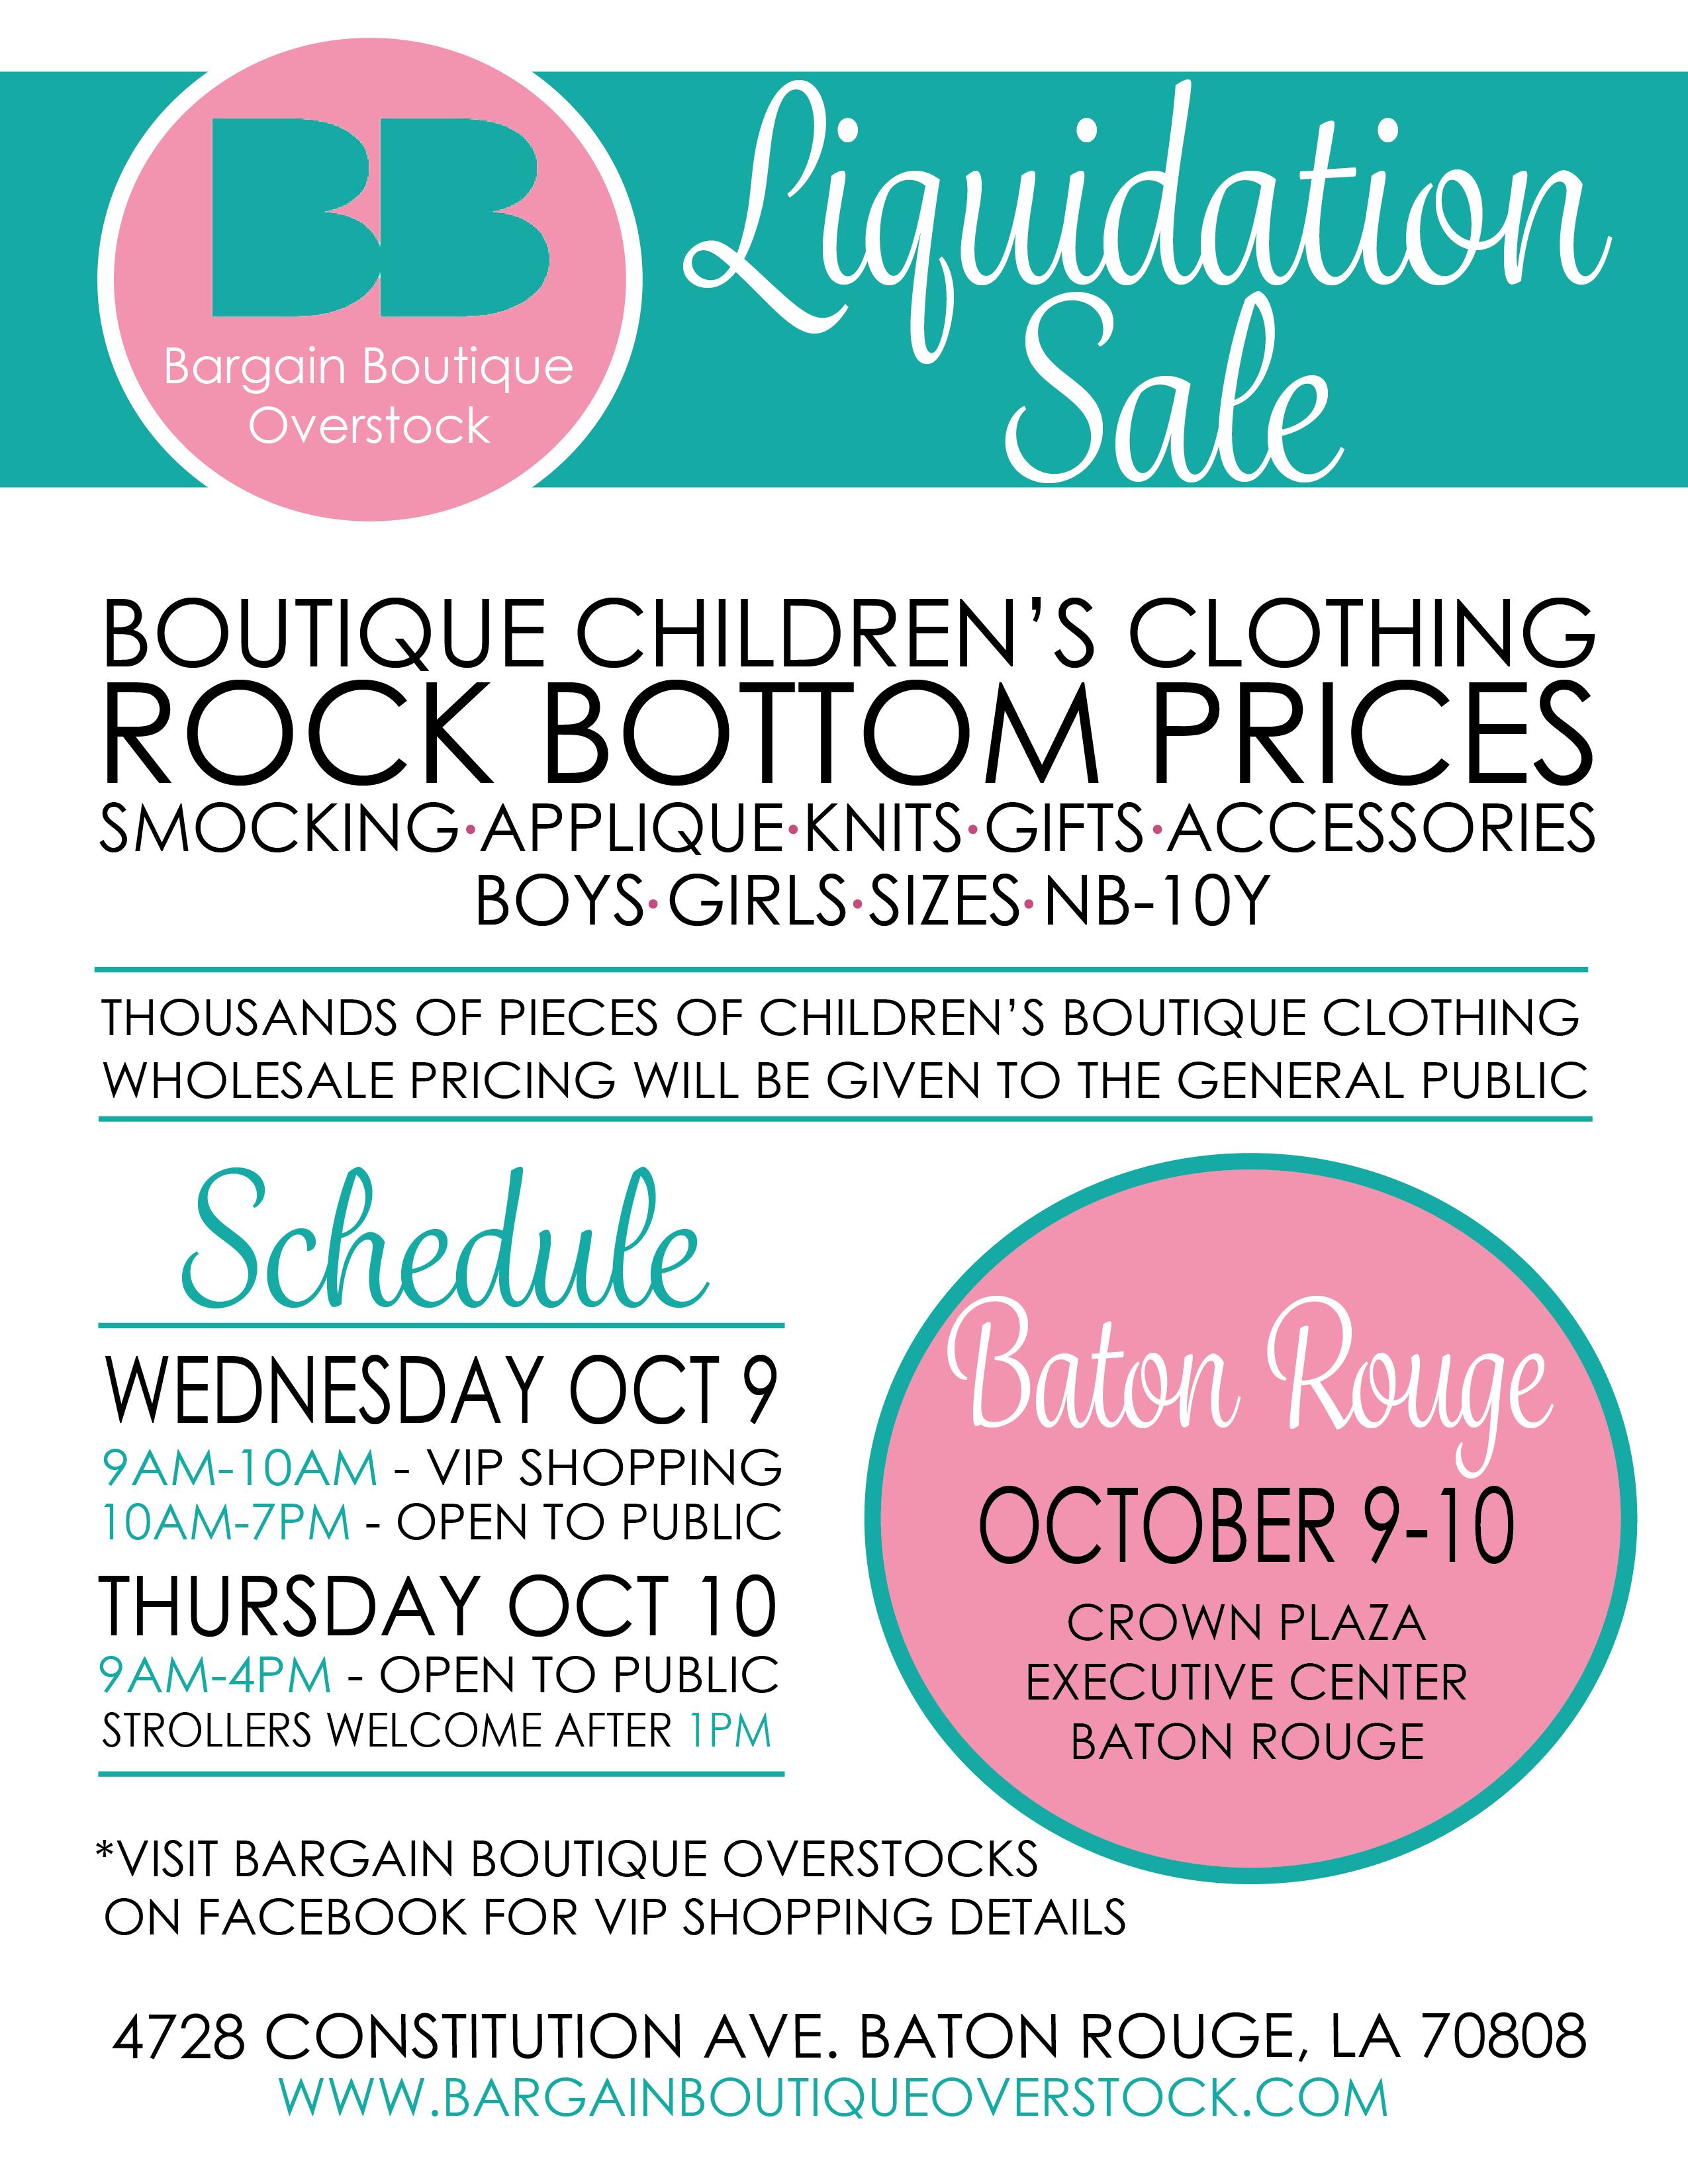 Baton Rouge Bargain Boutique Overstock